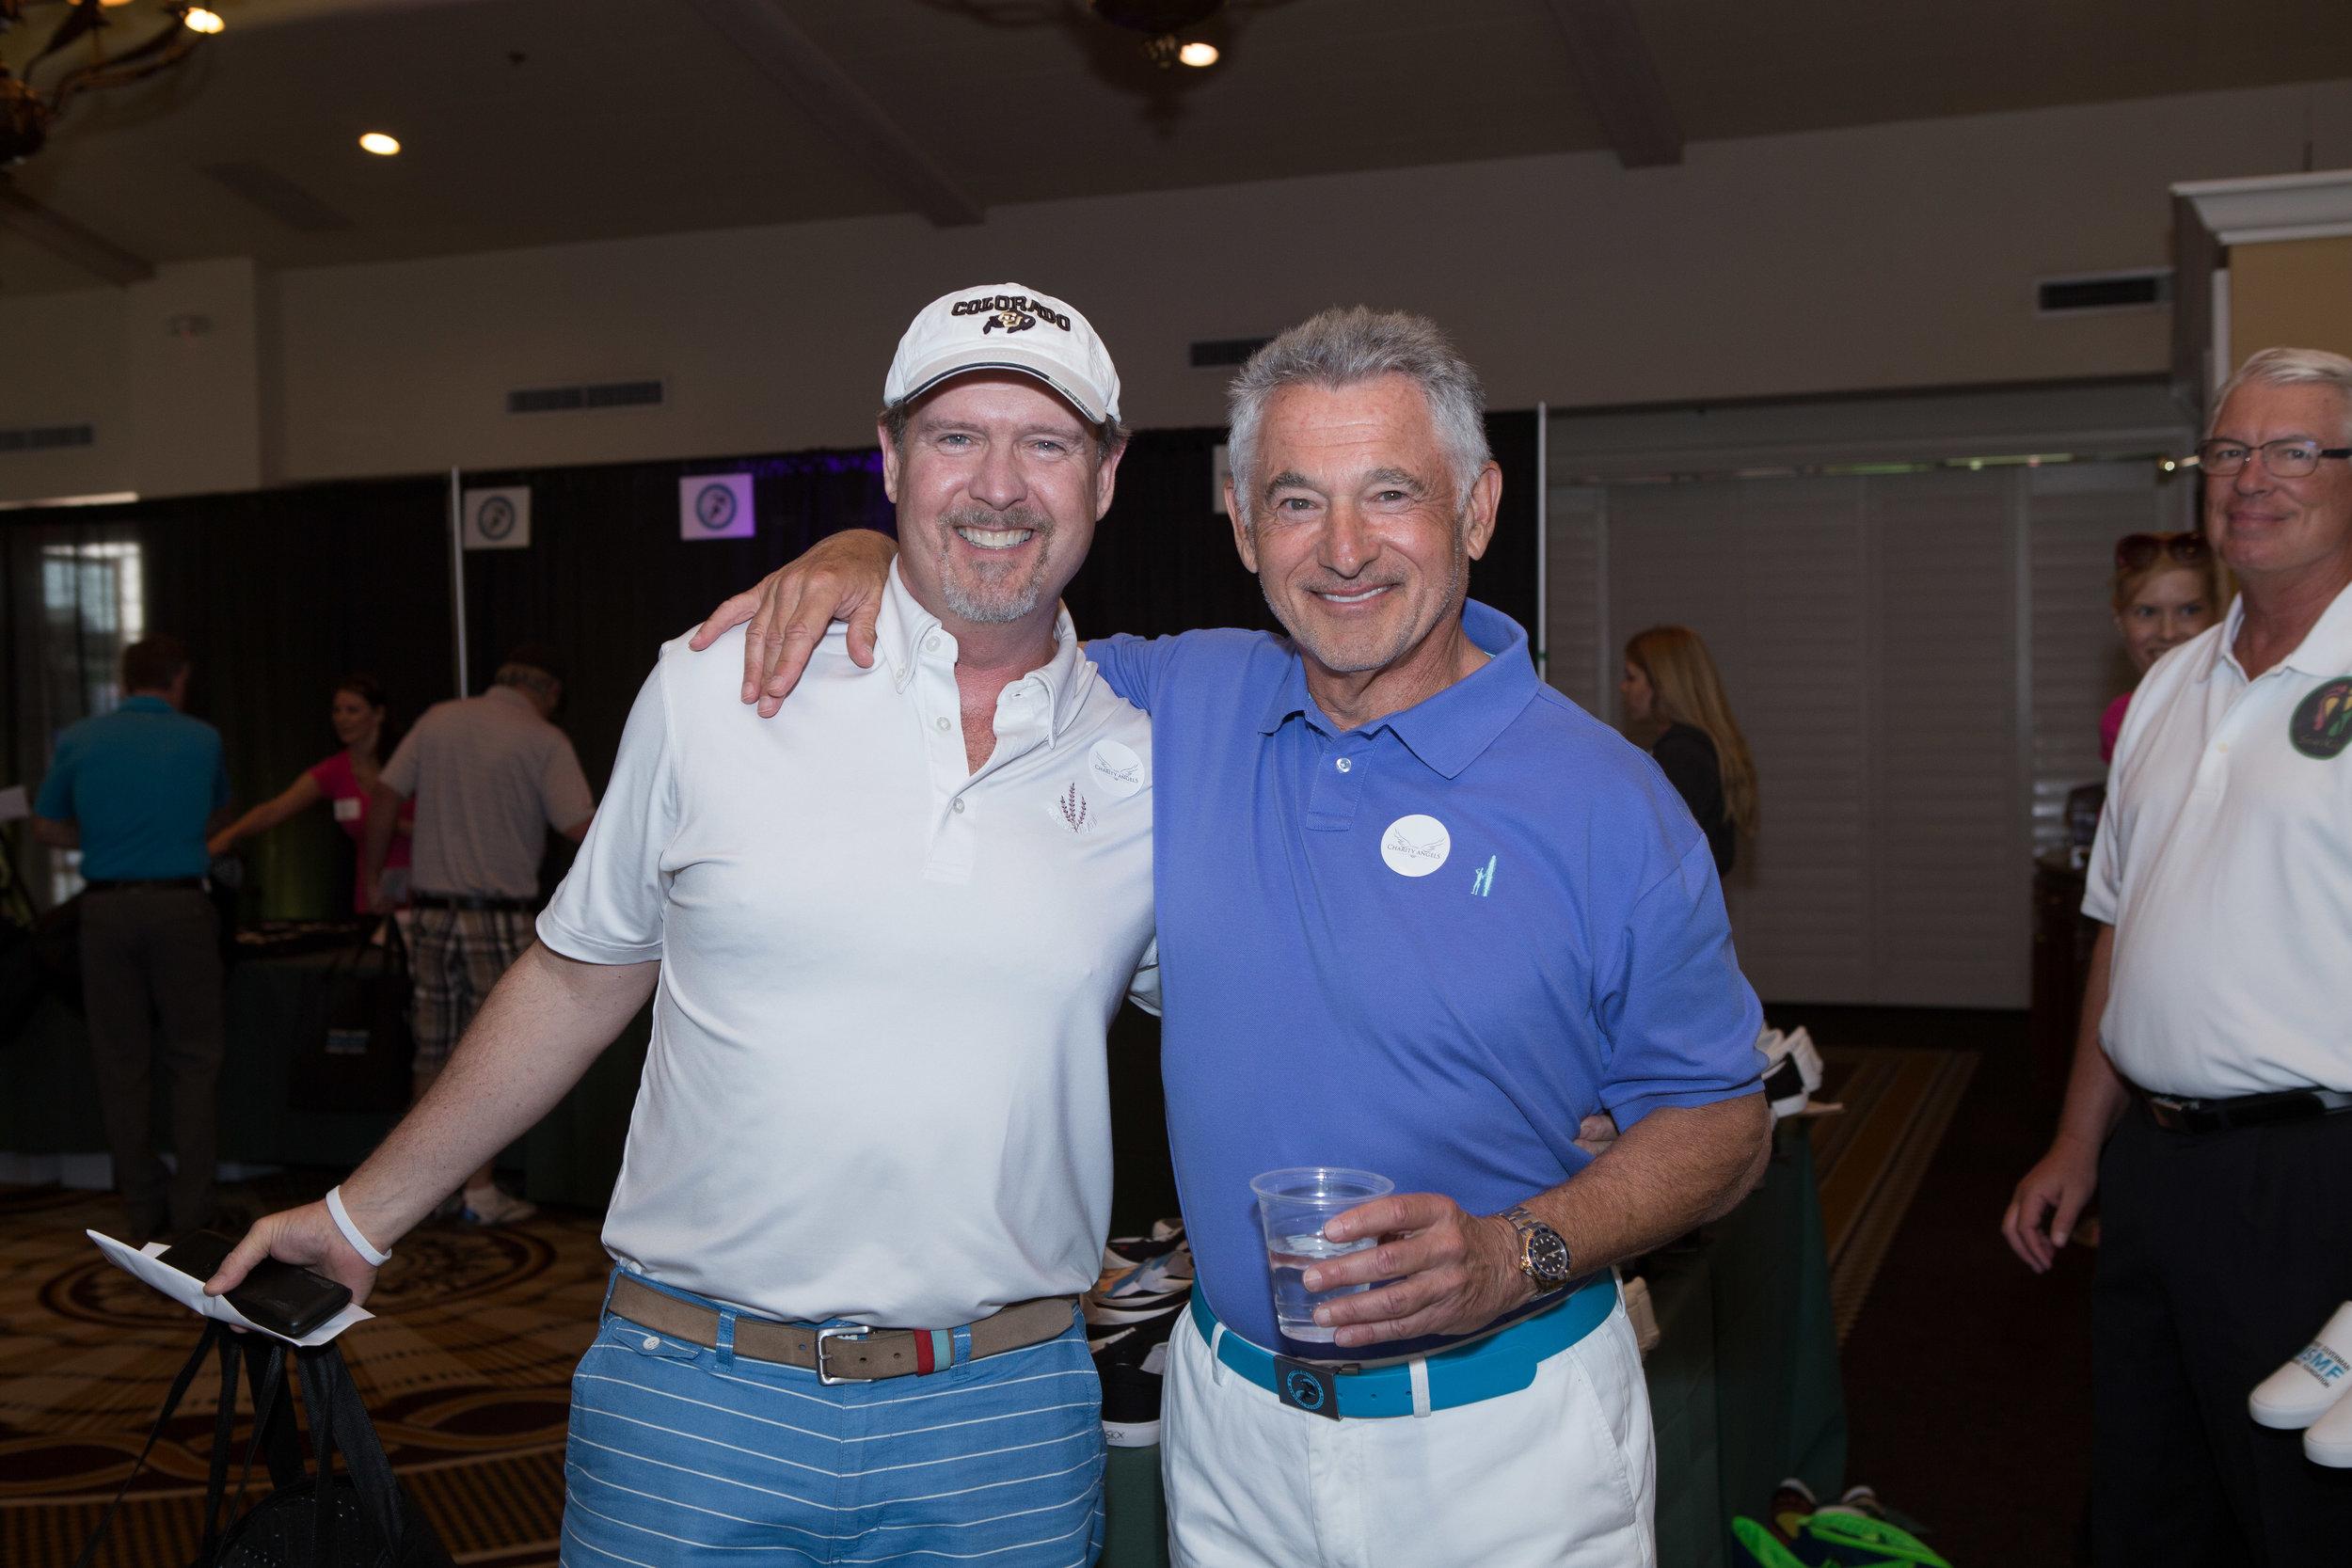 IMG_7728-Ron & Golfer.jpg